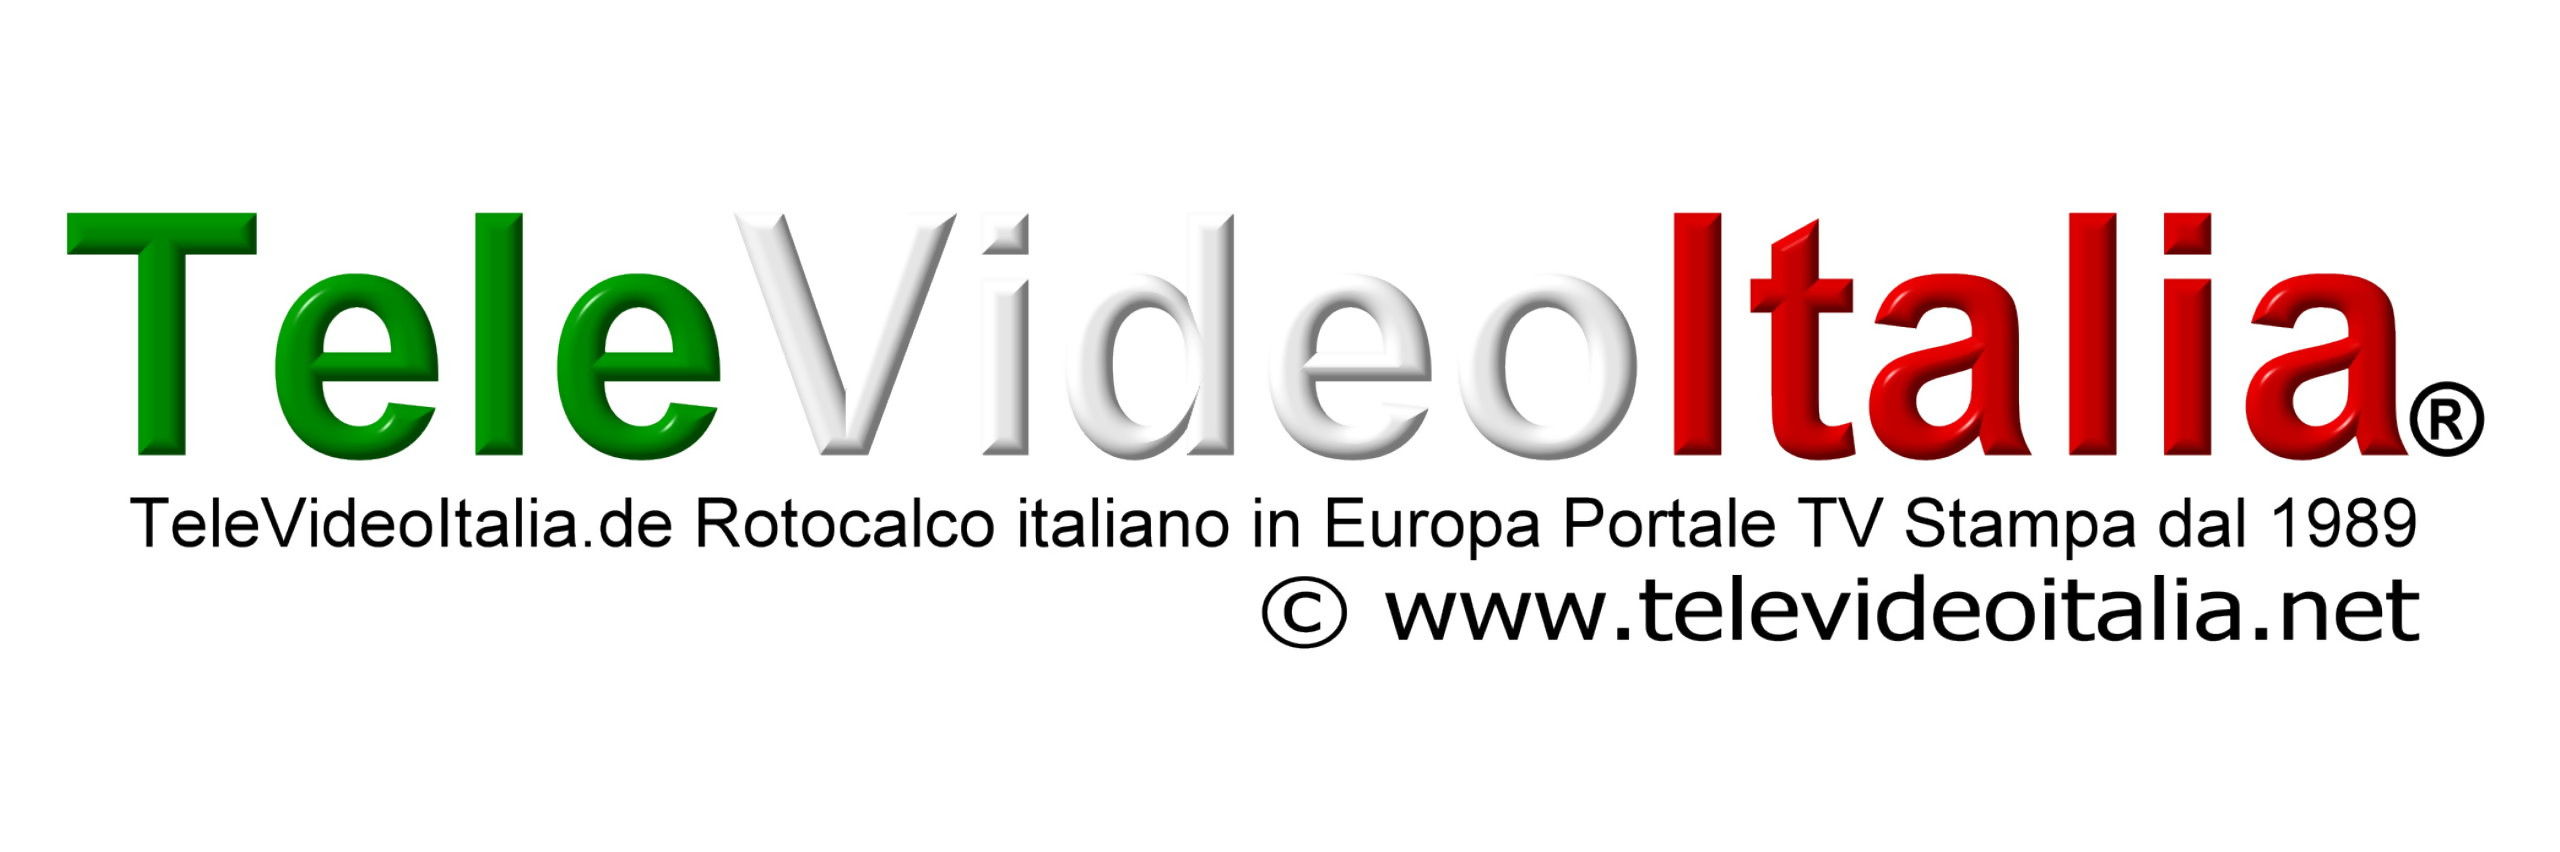 TeleVideoItalia.de